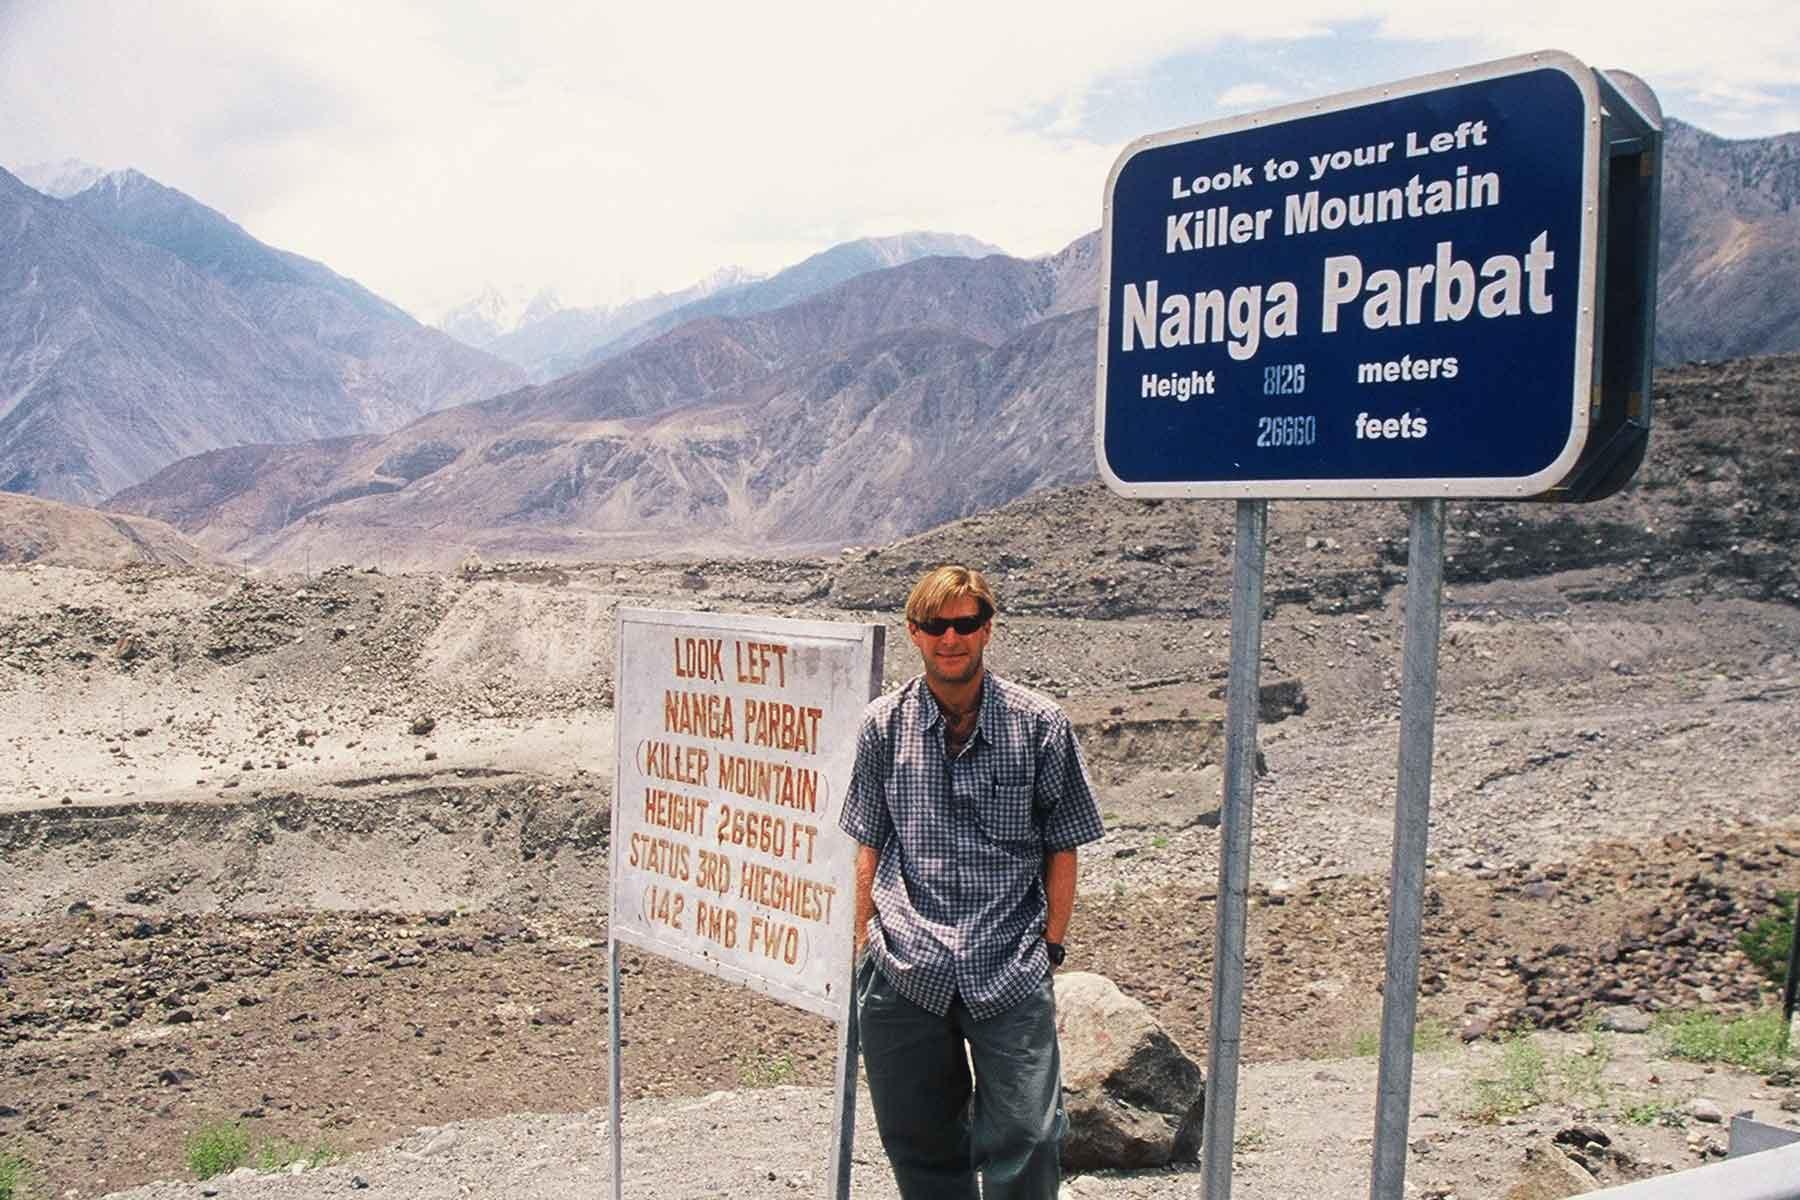 Nanga Parabat Killer Mountain - Pakistan Photo Journal - Steven Andrew Martin - Silk Road